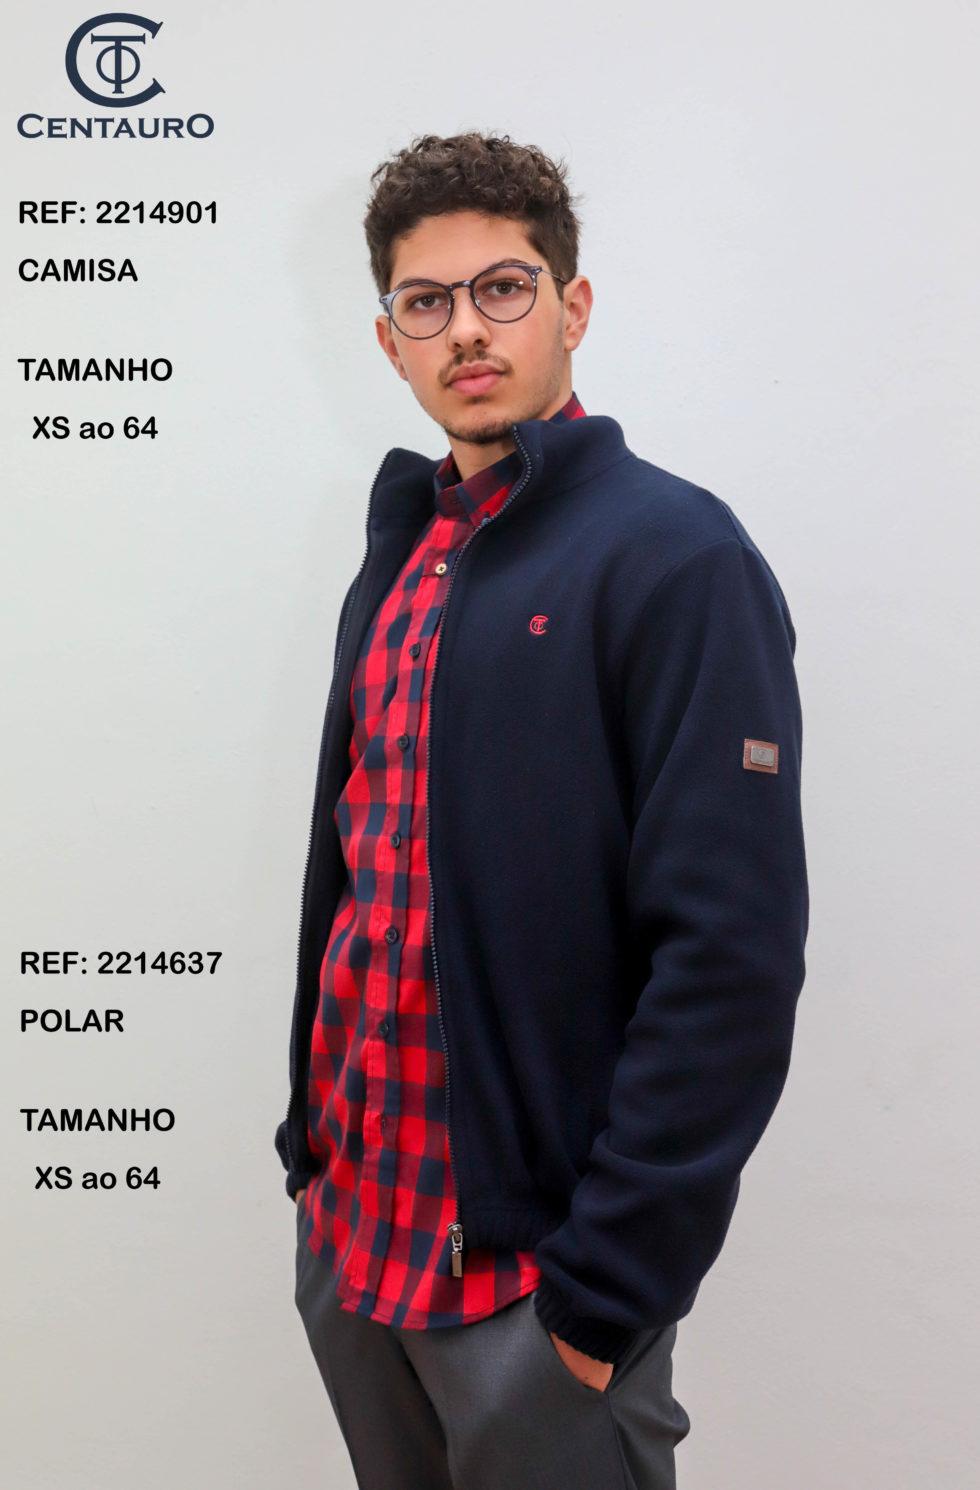 2214901-0 + 2214637-0 CASACO